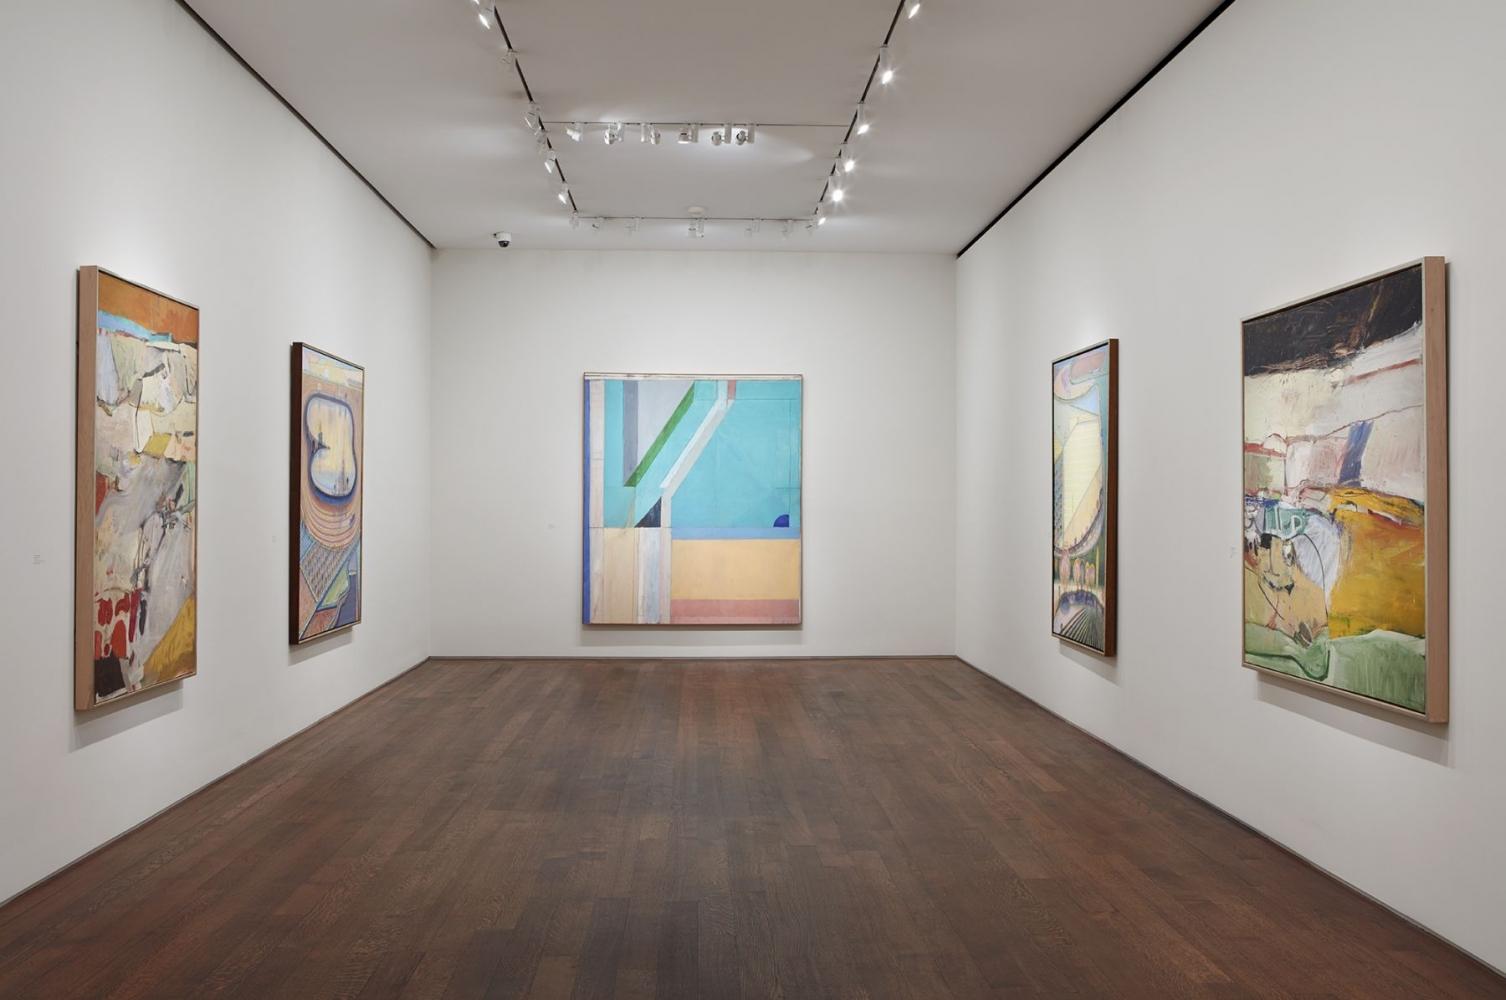 Installation view of California Landscapes: Richard Diebenkorn   Wayne Thiebaud, February 1 - March 16, 2018.